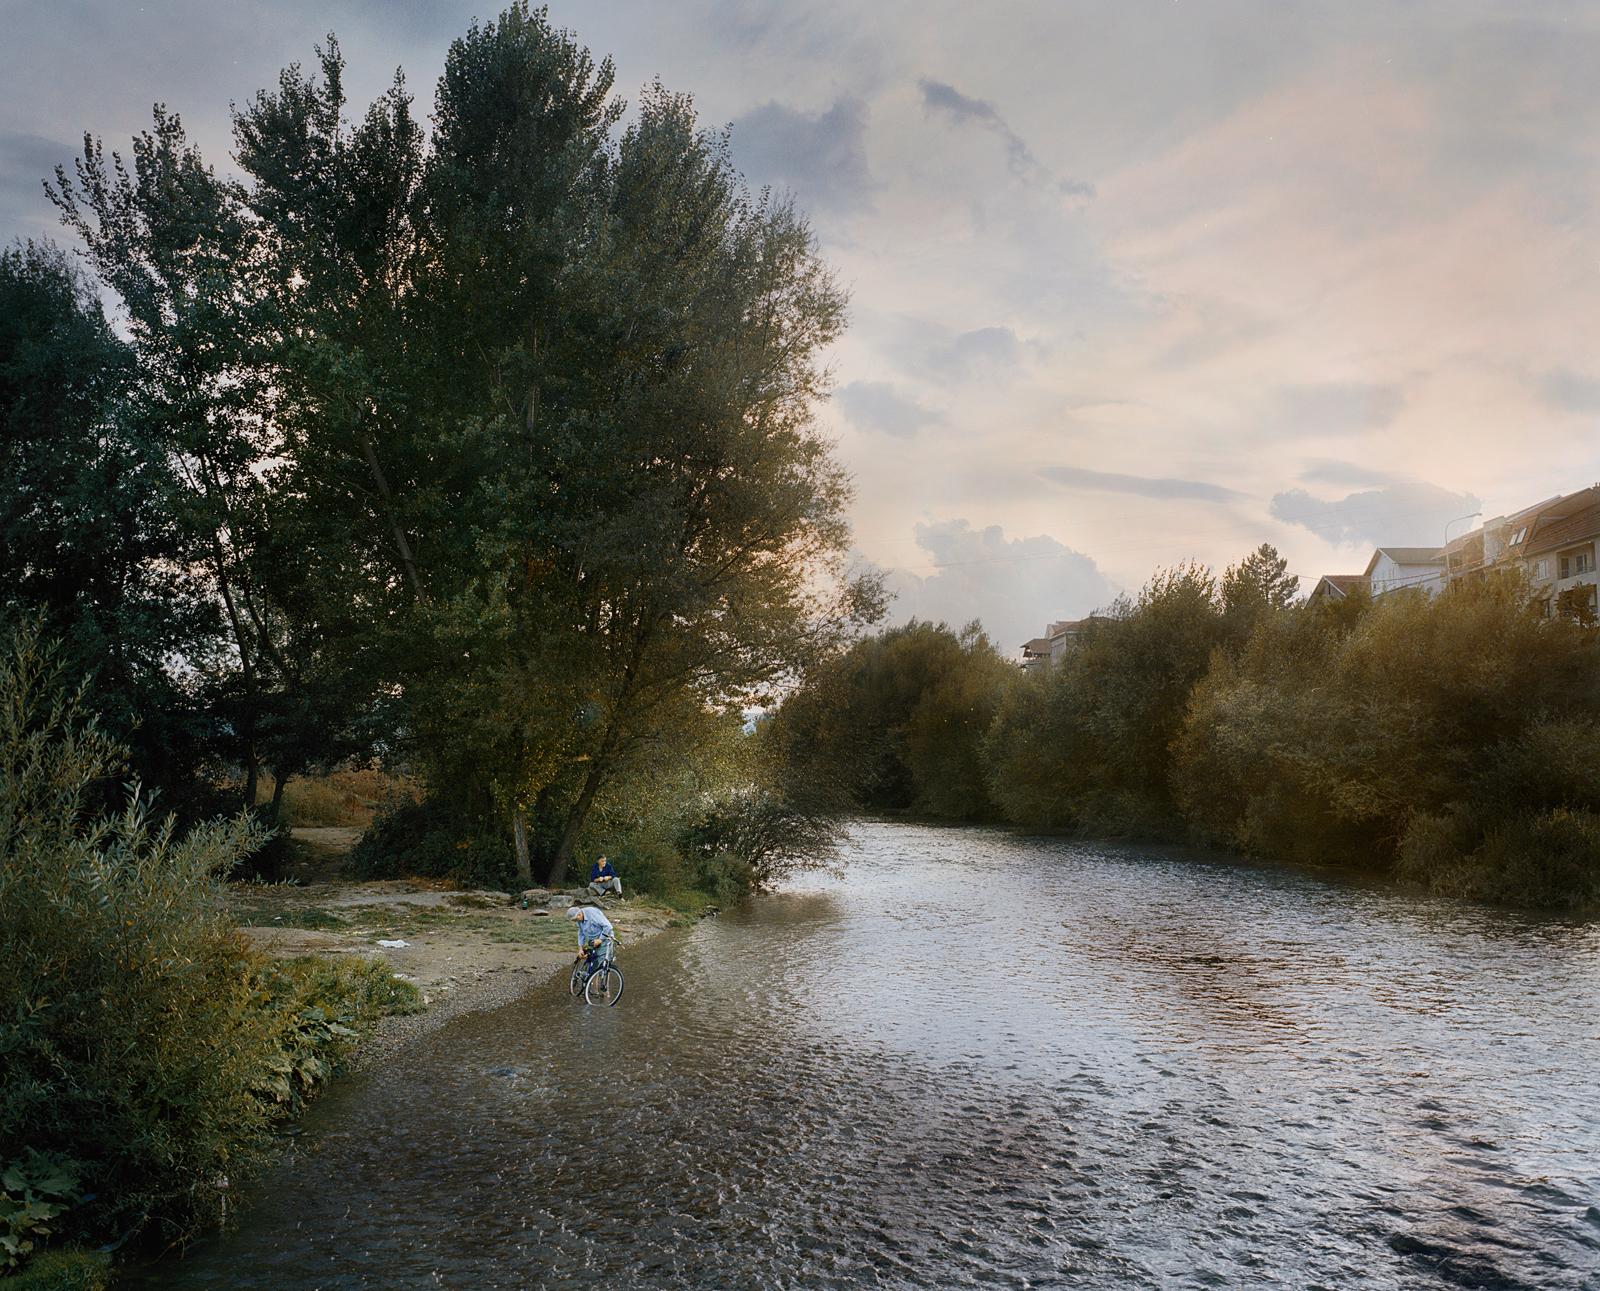 OFF Circuit 2015_Ôö¼-«Jasper Bastian_Across the River - Tales of a Divided City2